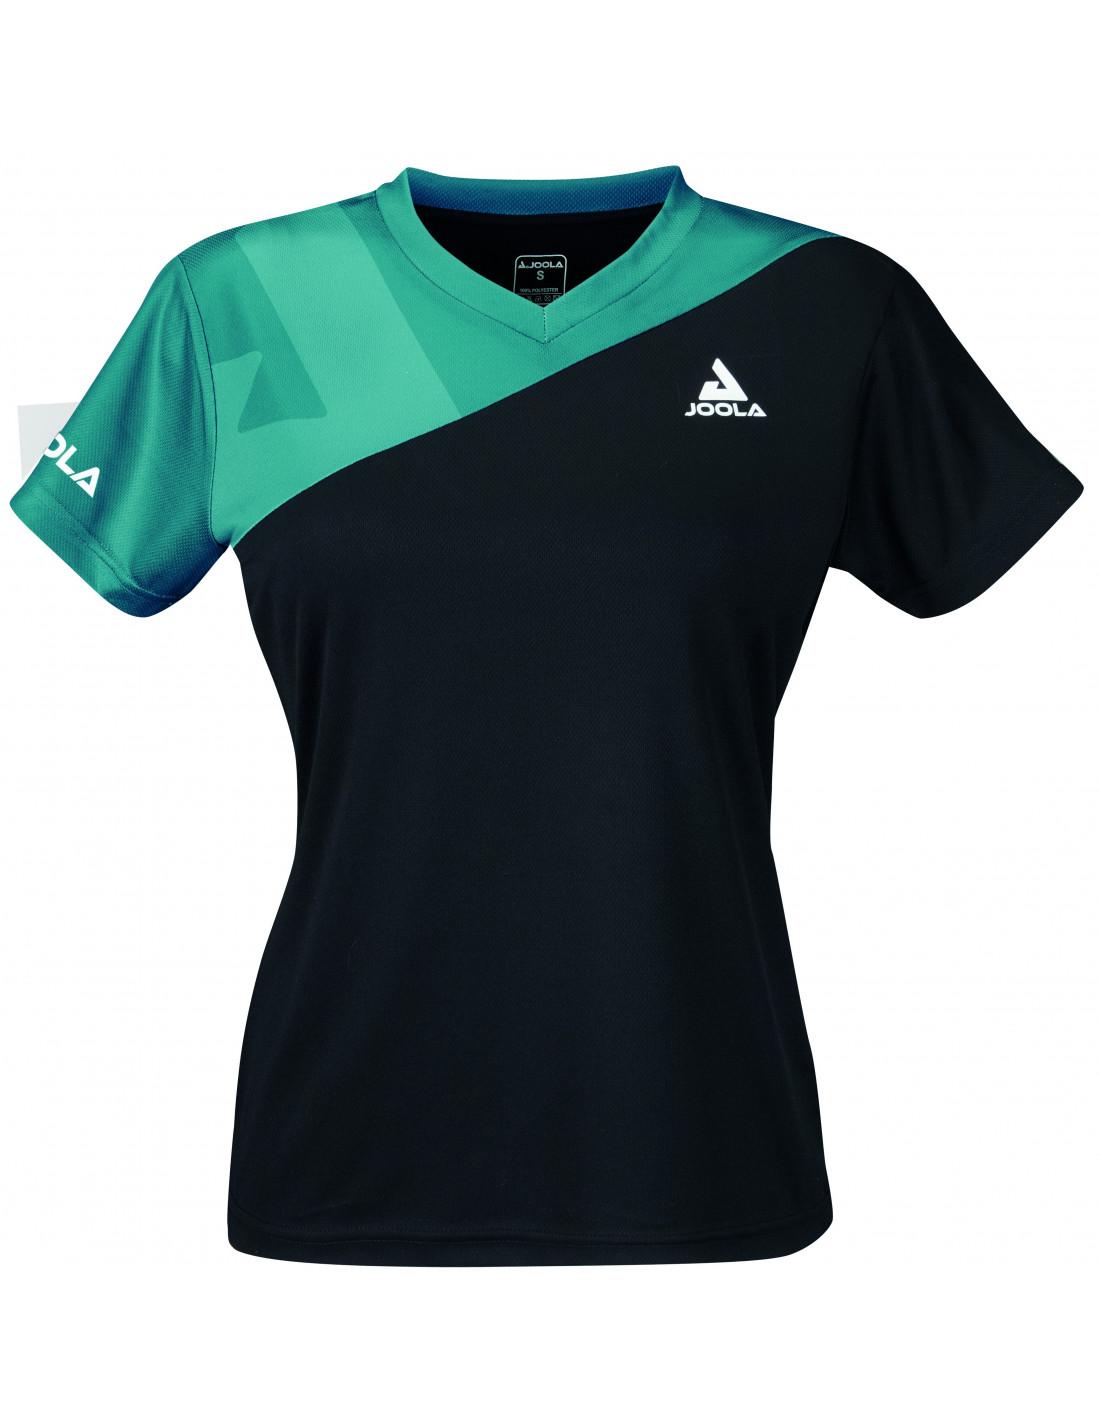 Tibhar Shirt Spectra, Options d' S, Bleu/Bleu Marine